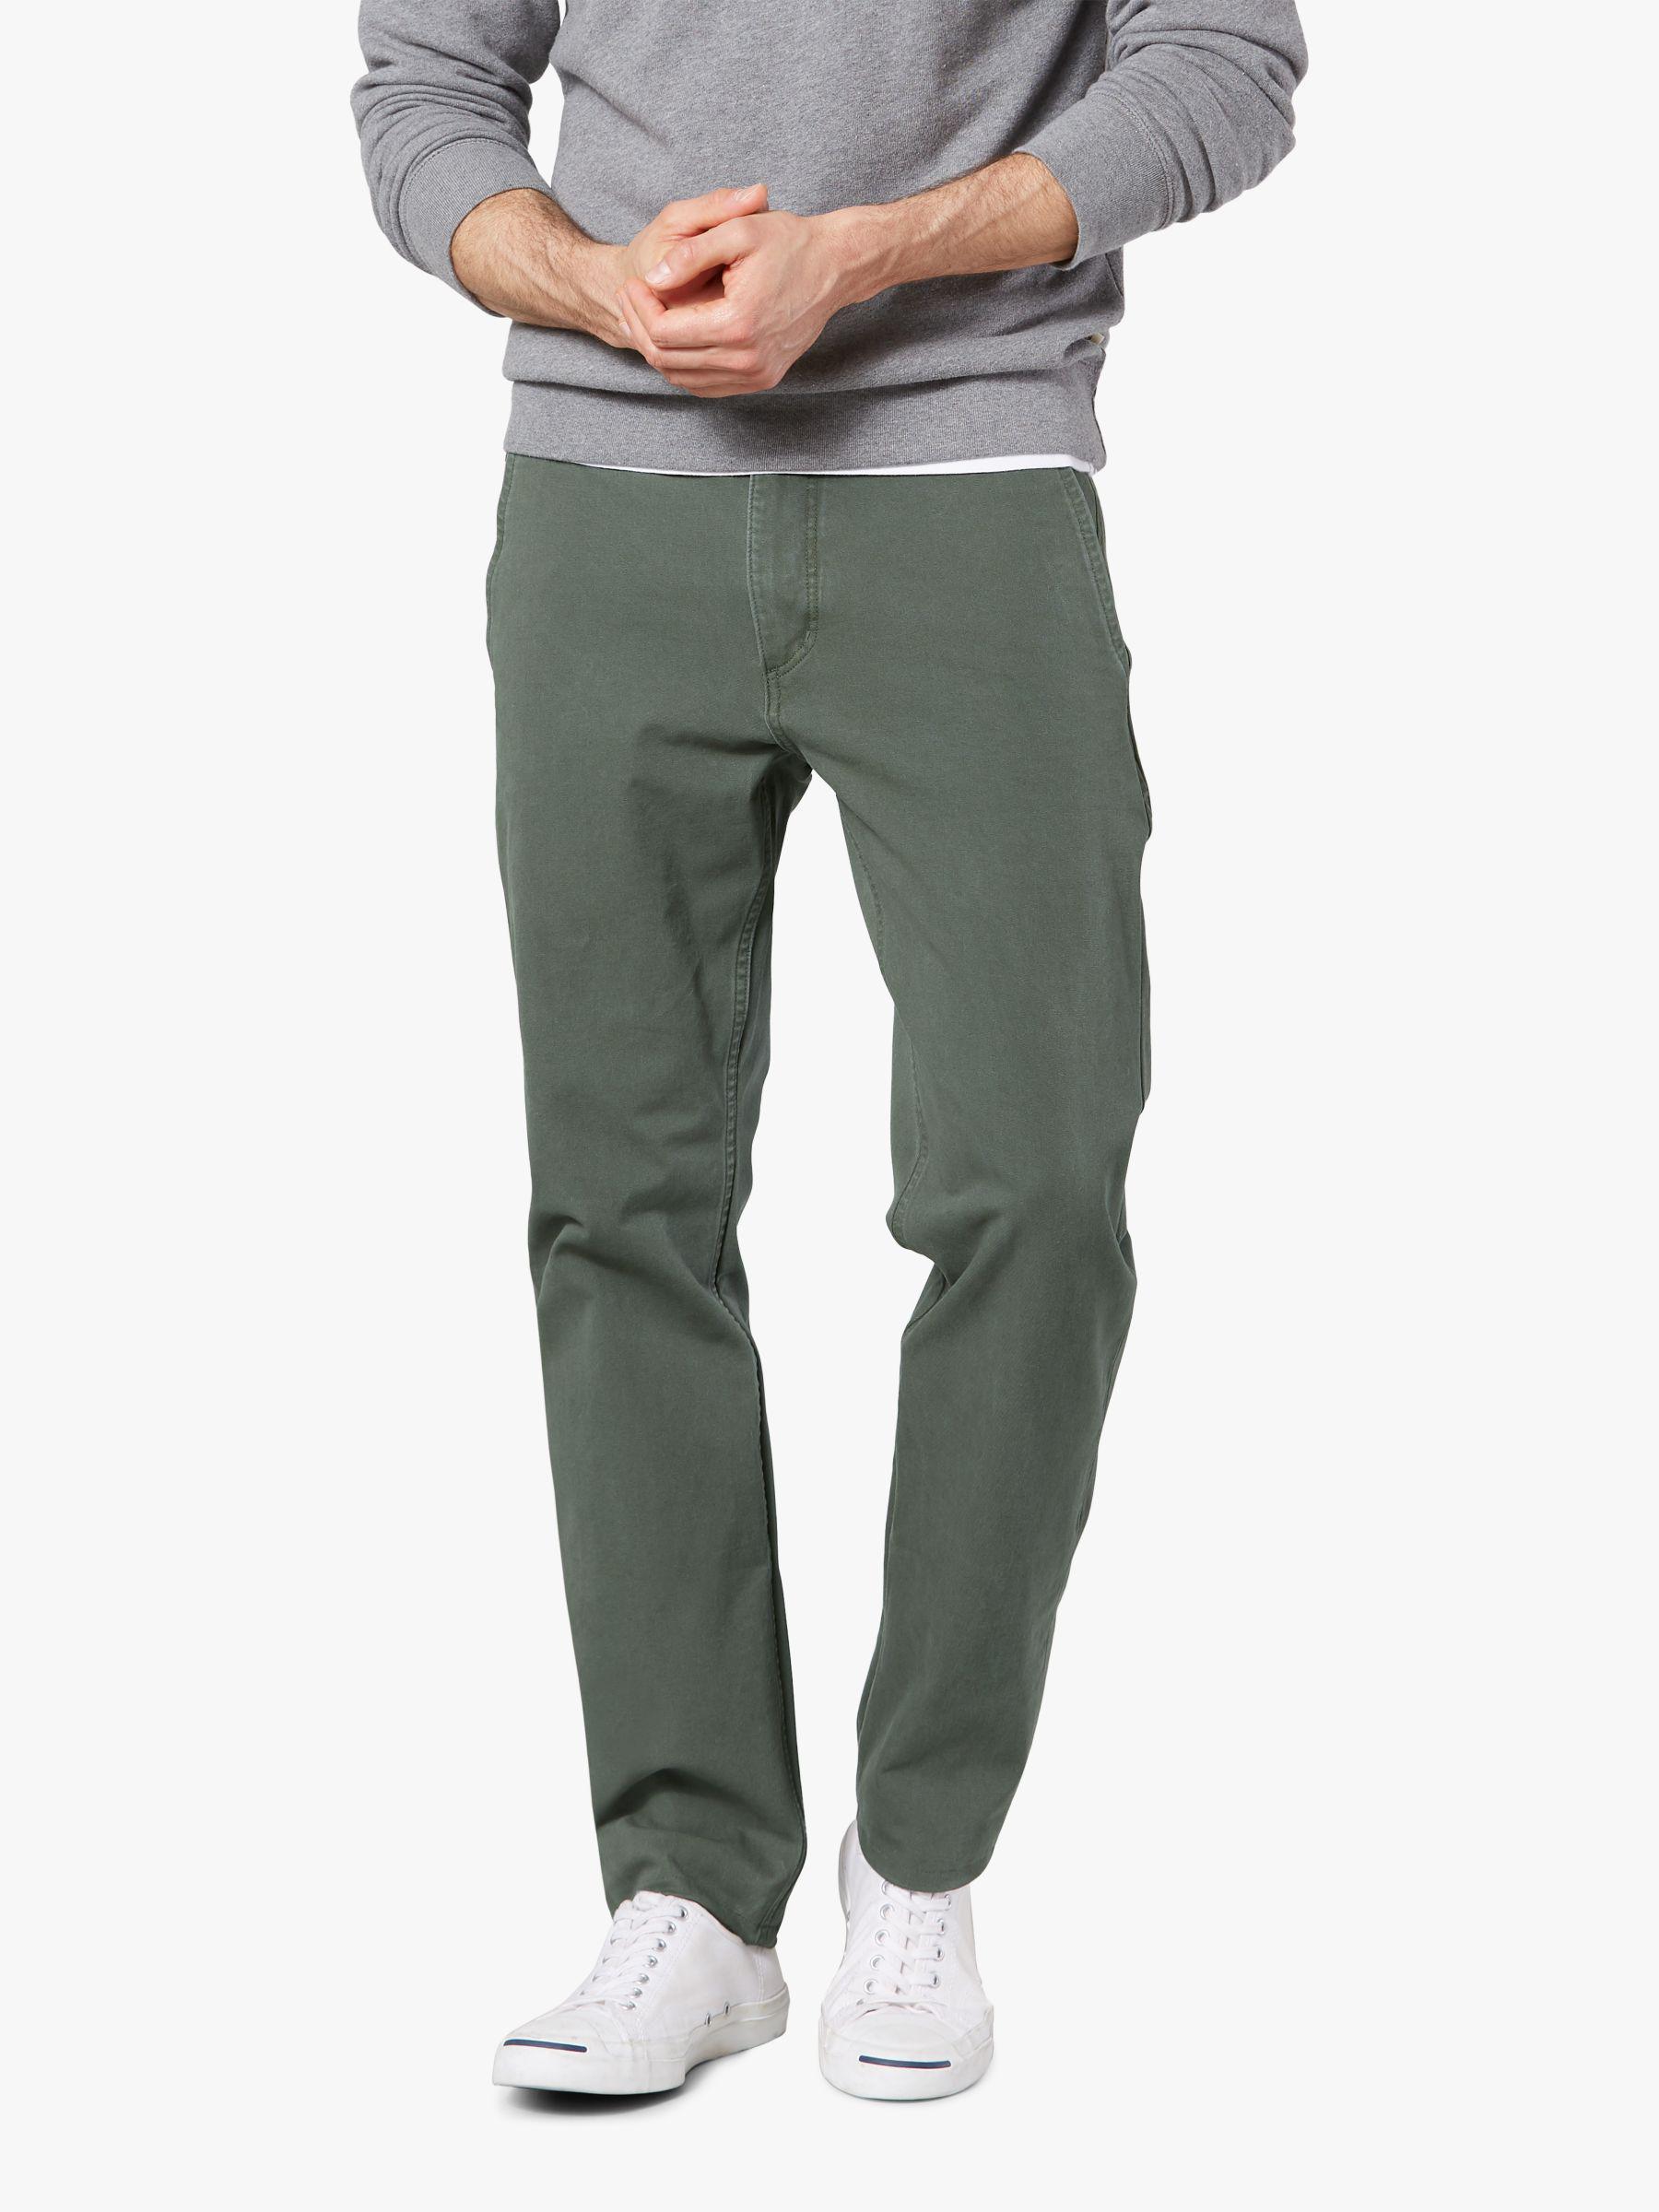 45fb46653bad43 Dockers Alpha Khaki Smart 360 Flex Slim Tapered Trousers in Green ...